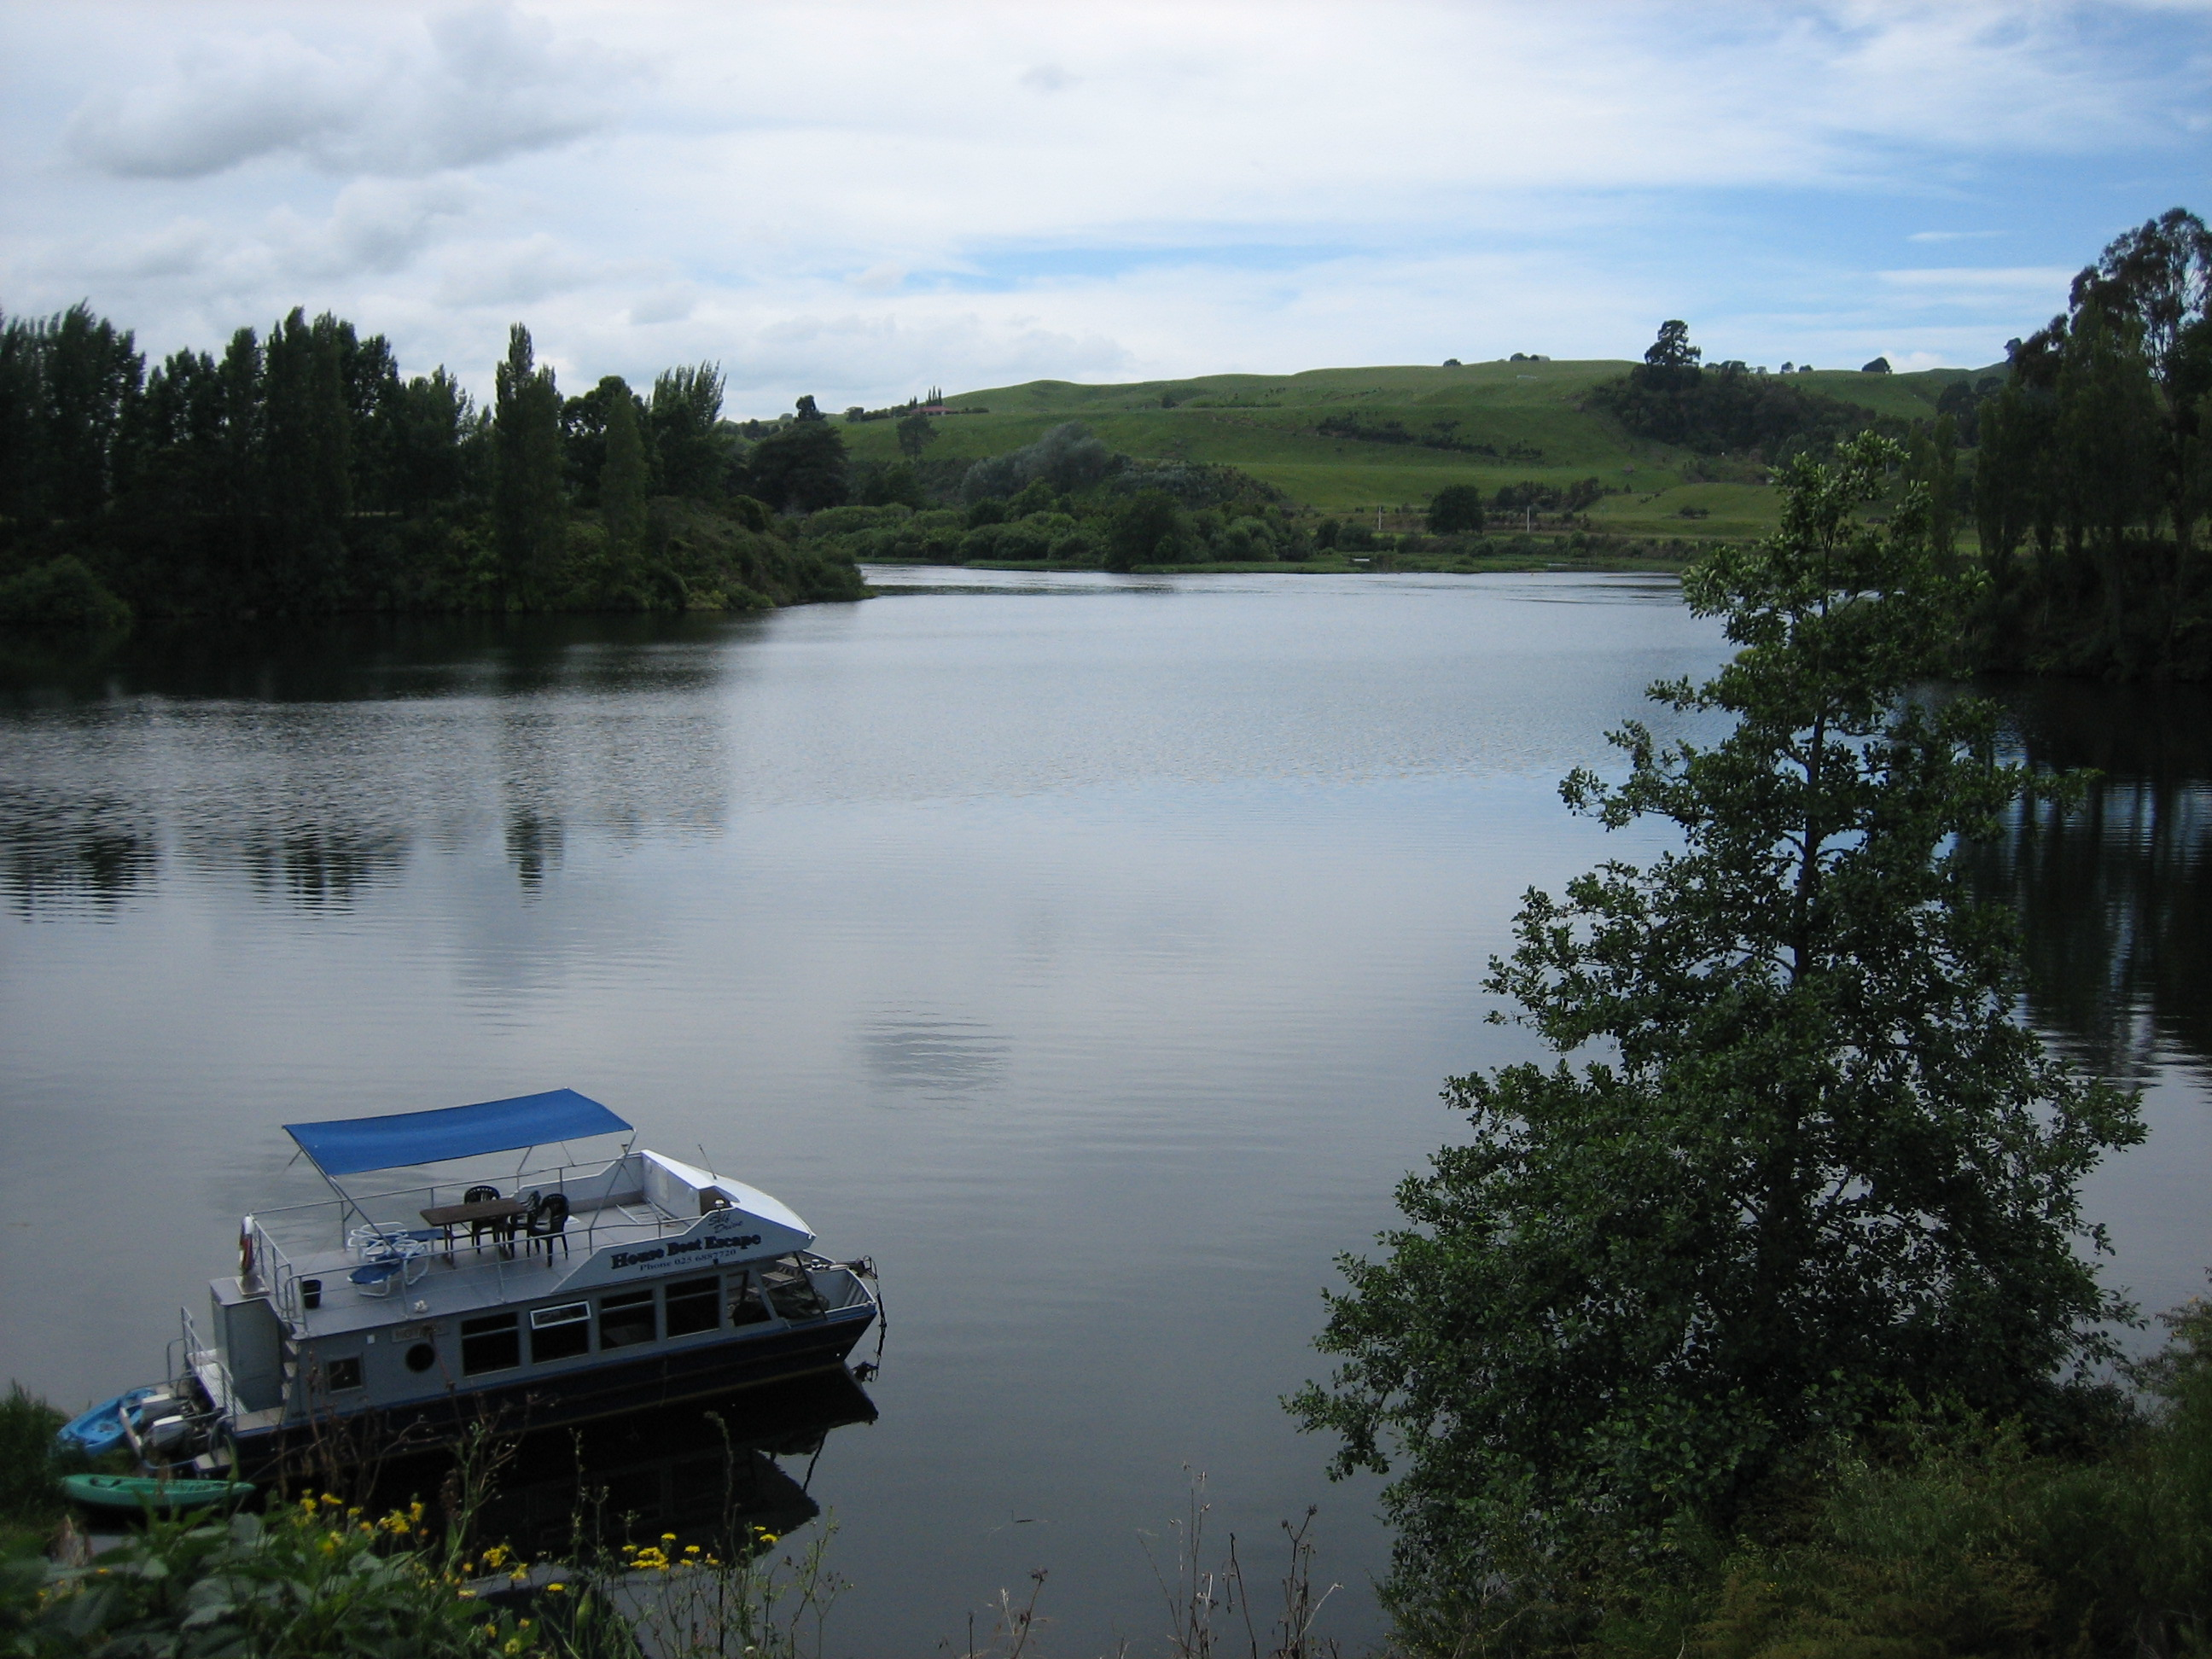 lake karapiro vs st louis park minnesota tournament